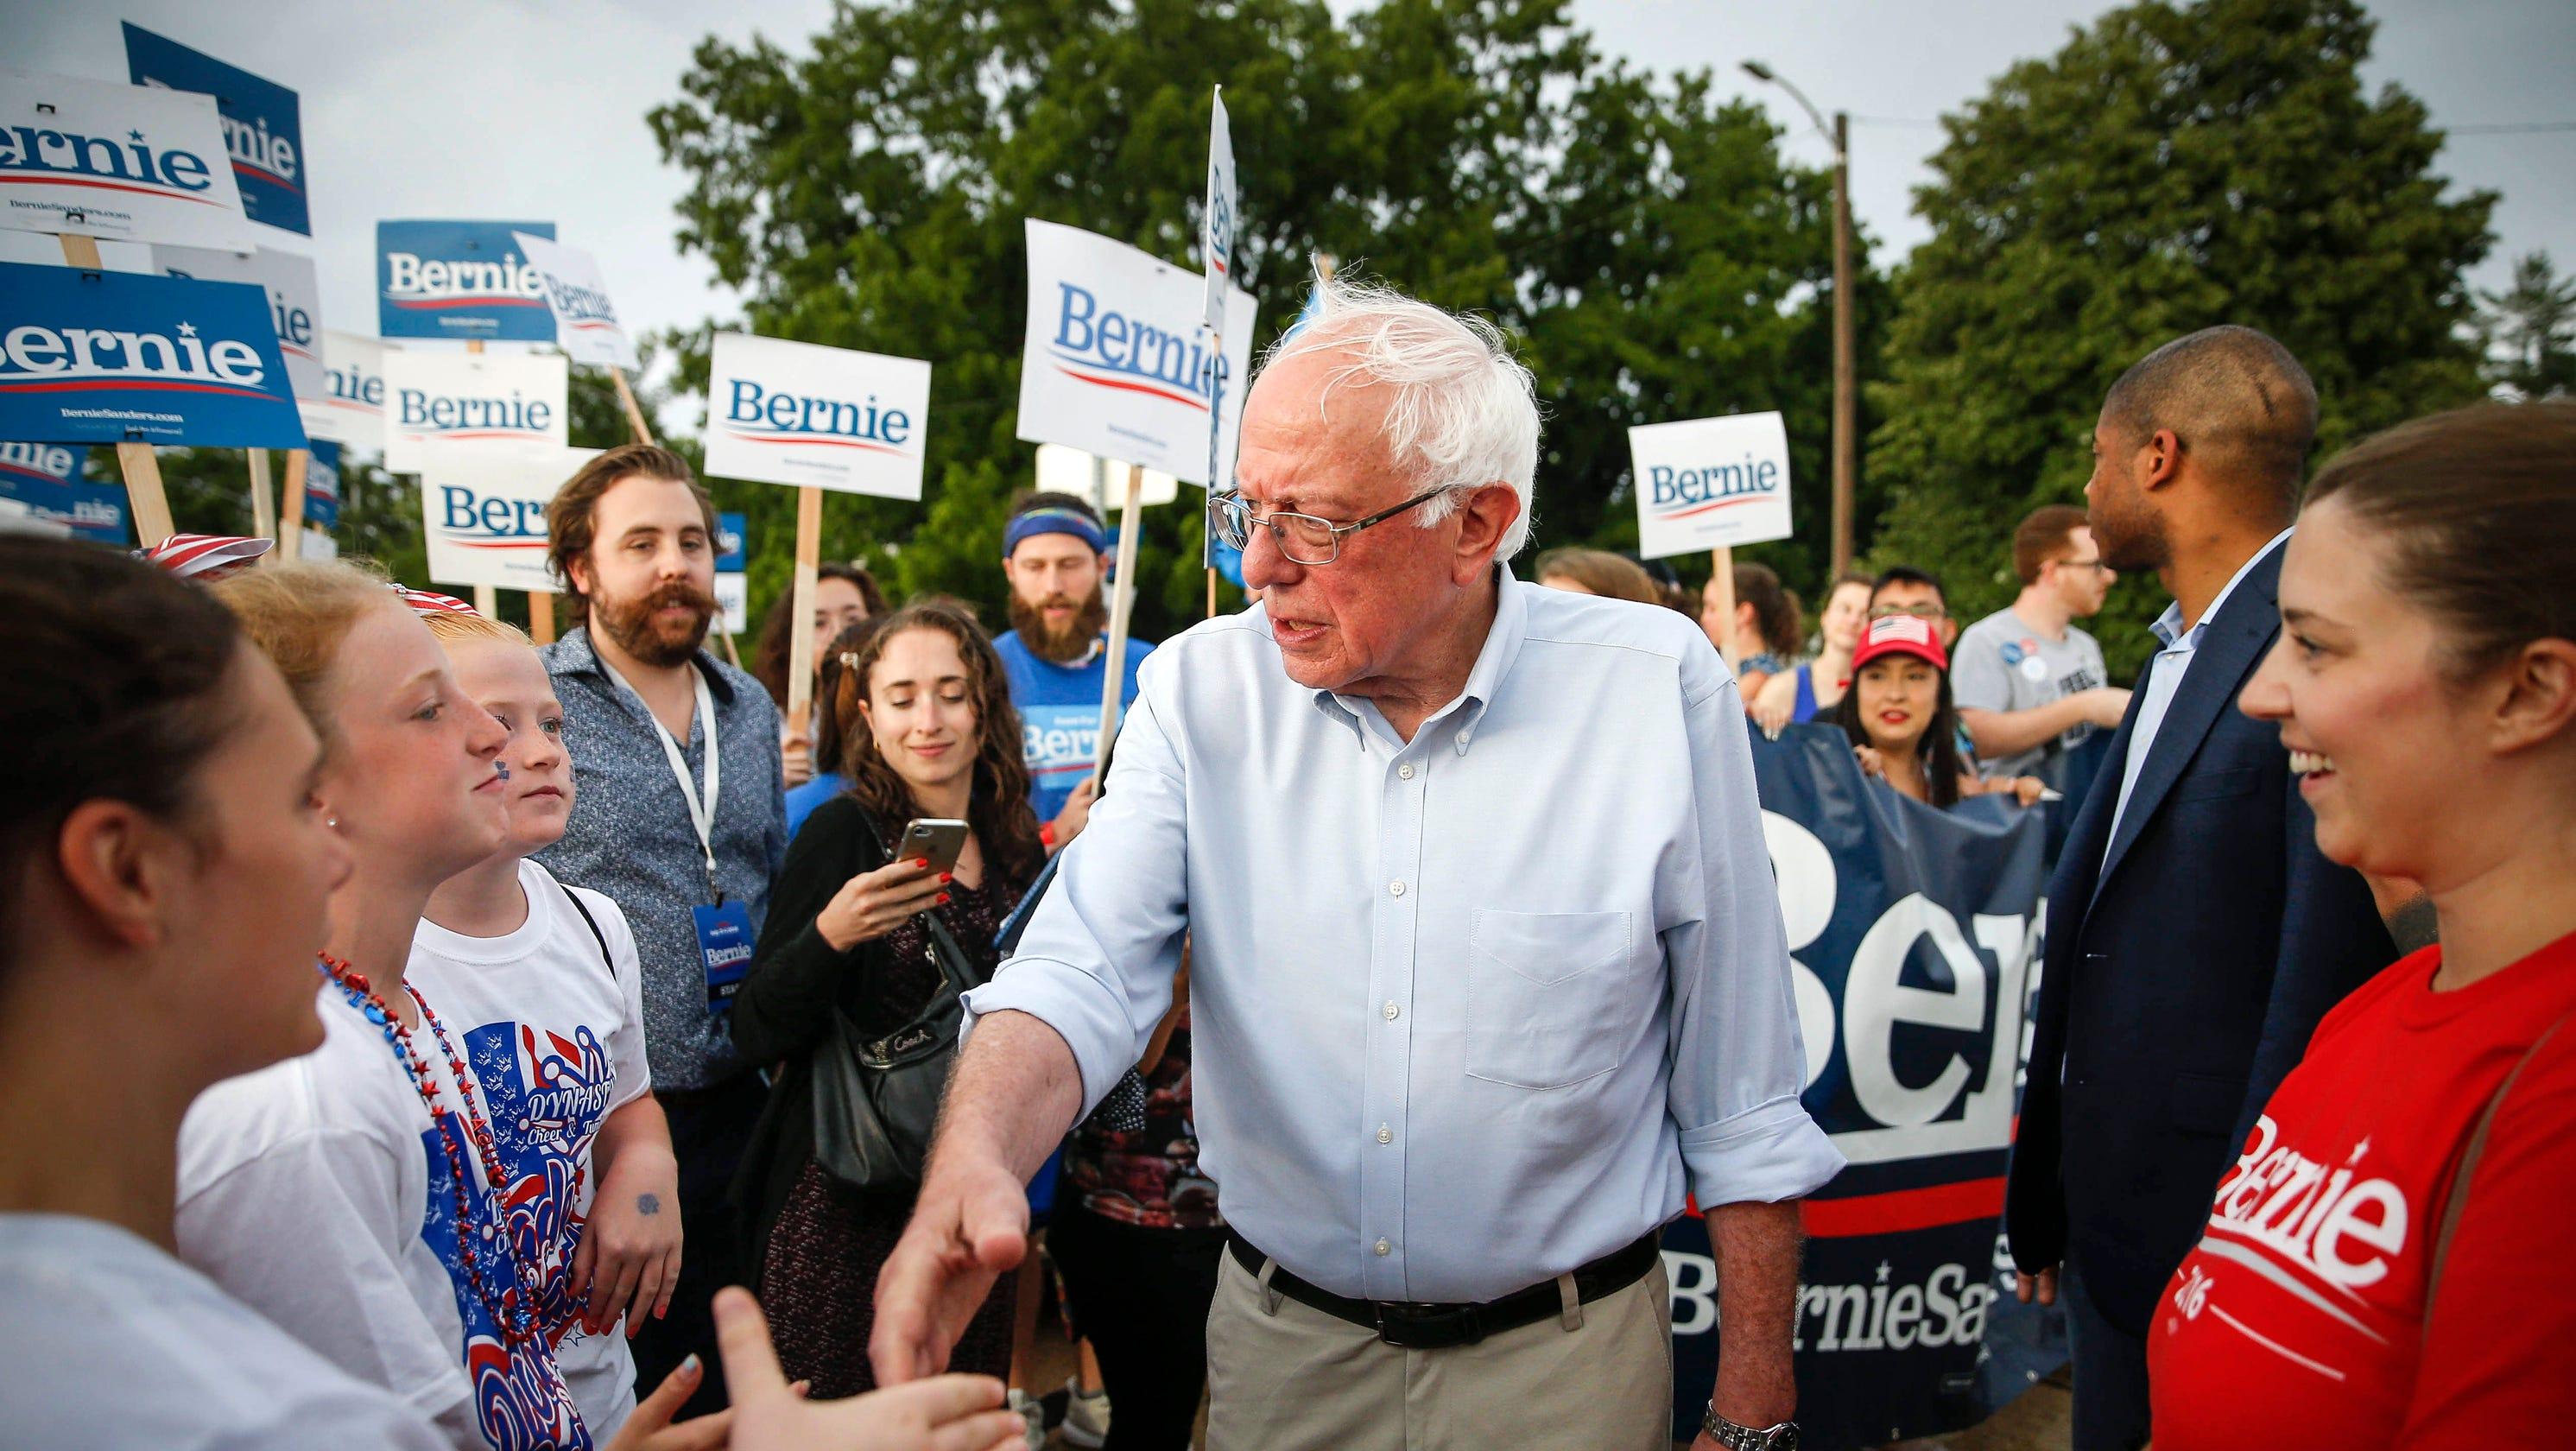 Bernie Sanders responds to complaints staff don't earn $15